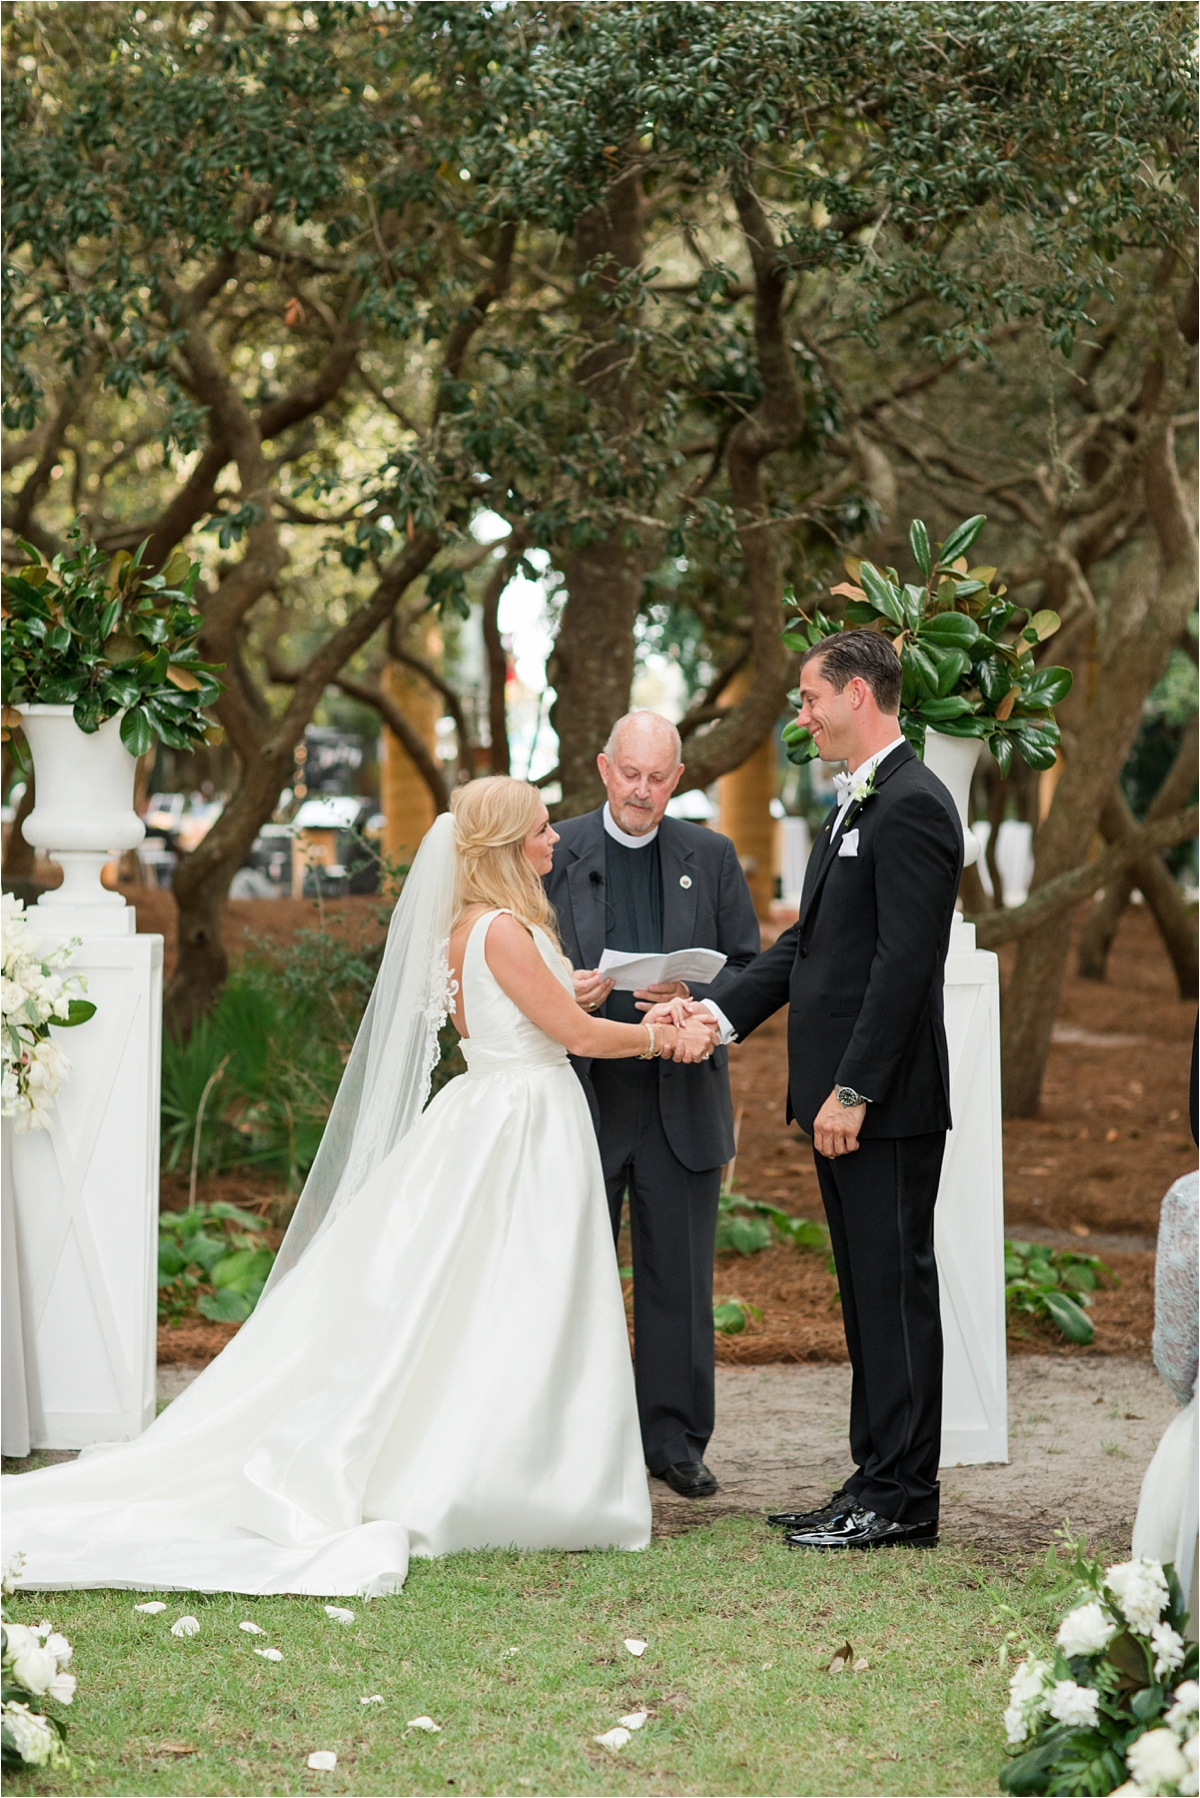 Seaside Florida Wedding Photographer-Catherine Carter + Brian-Alabama photographer-Bride and groom